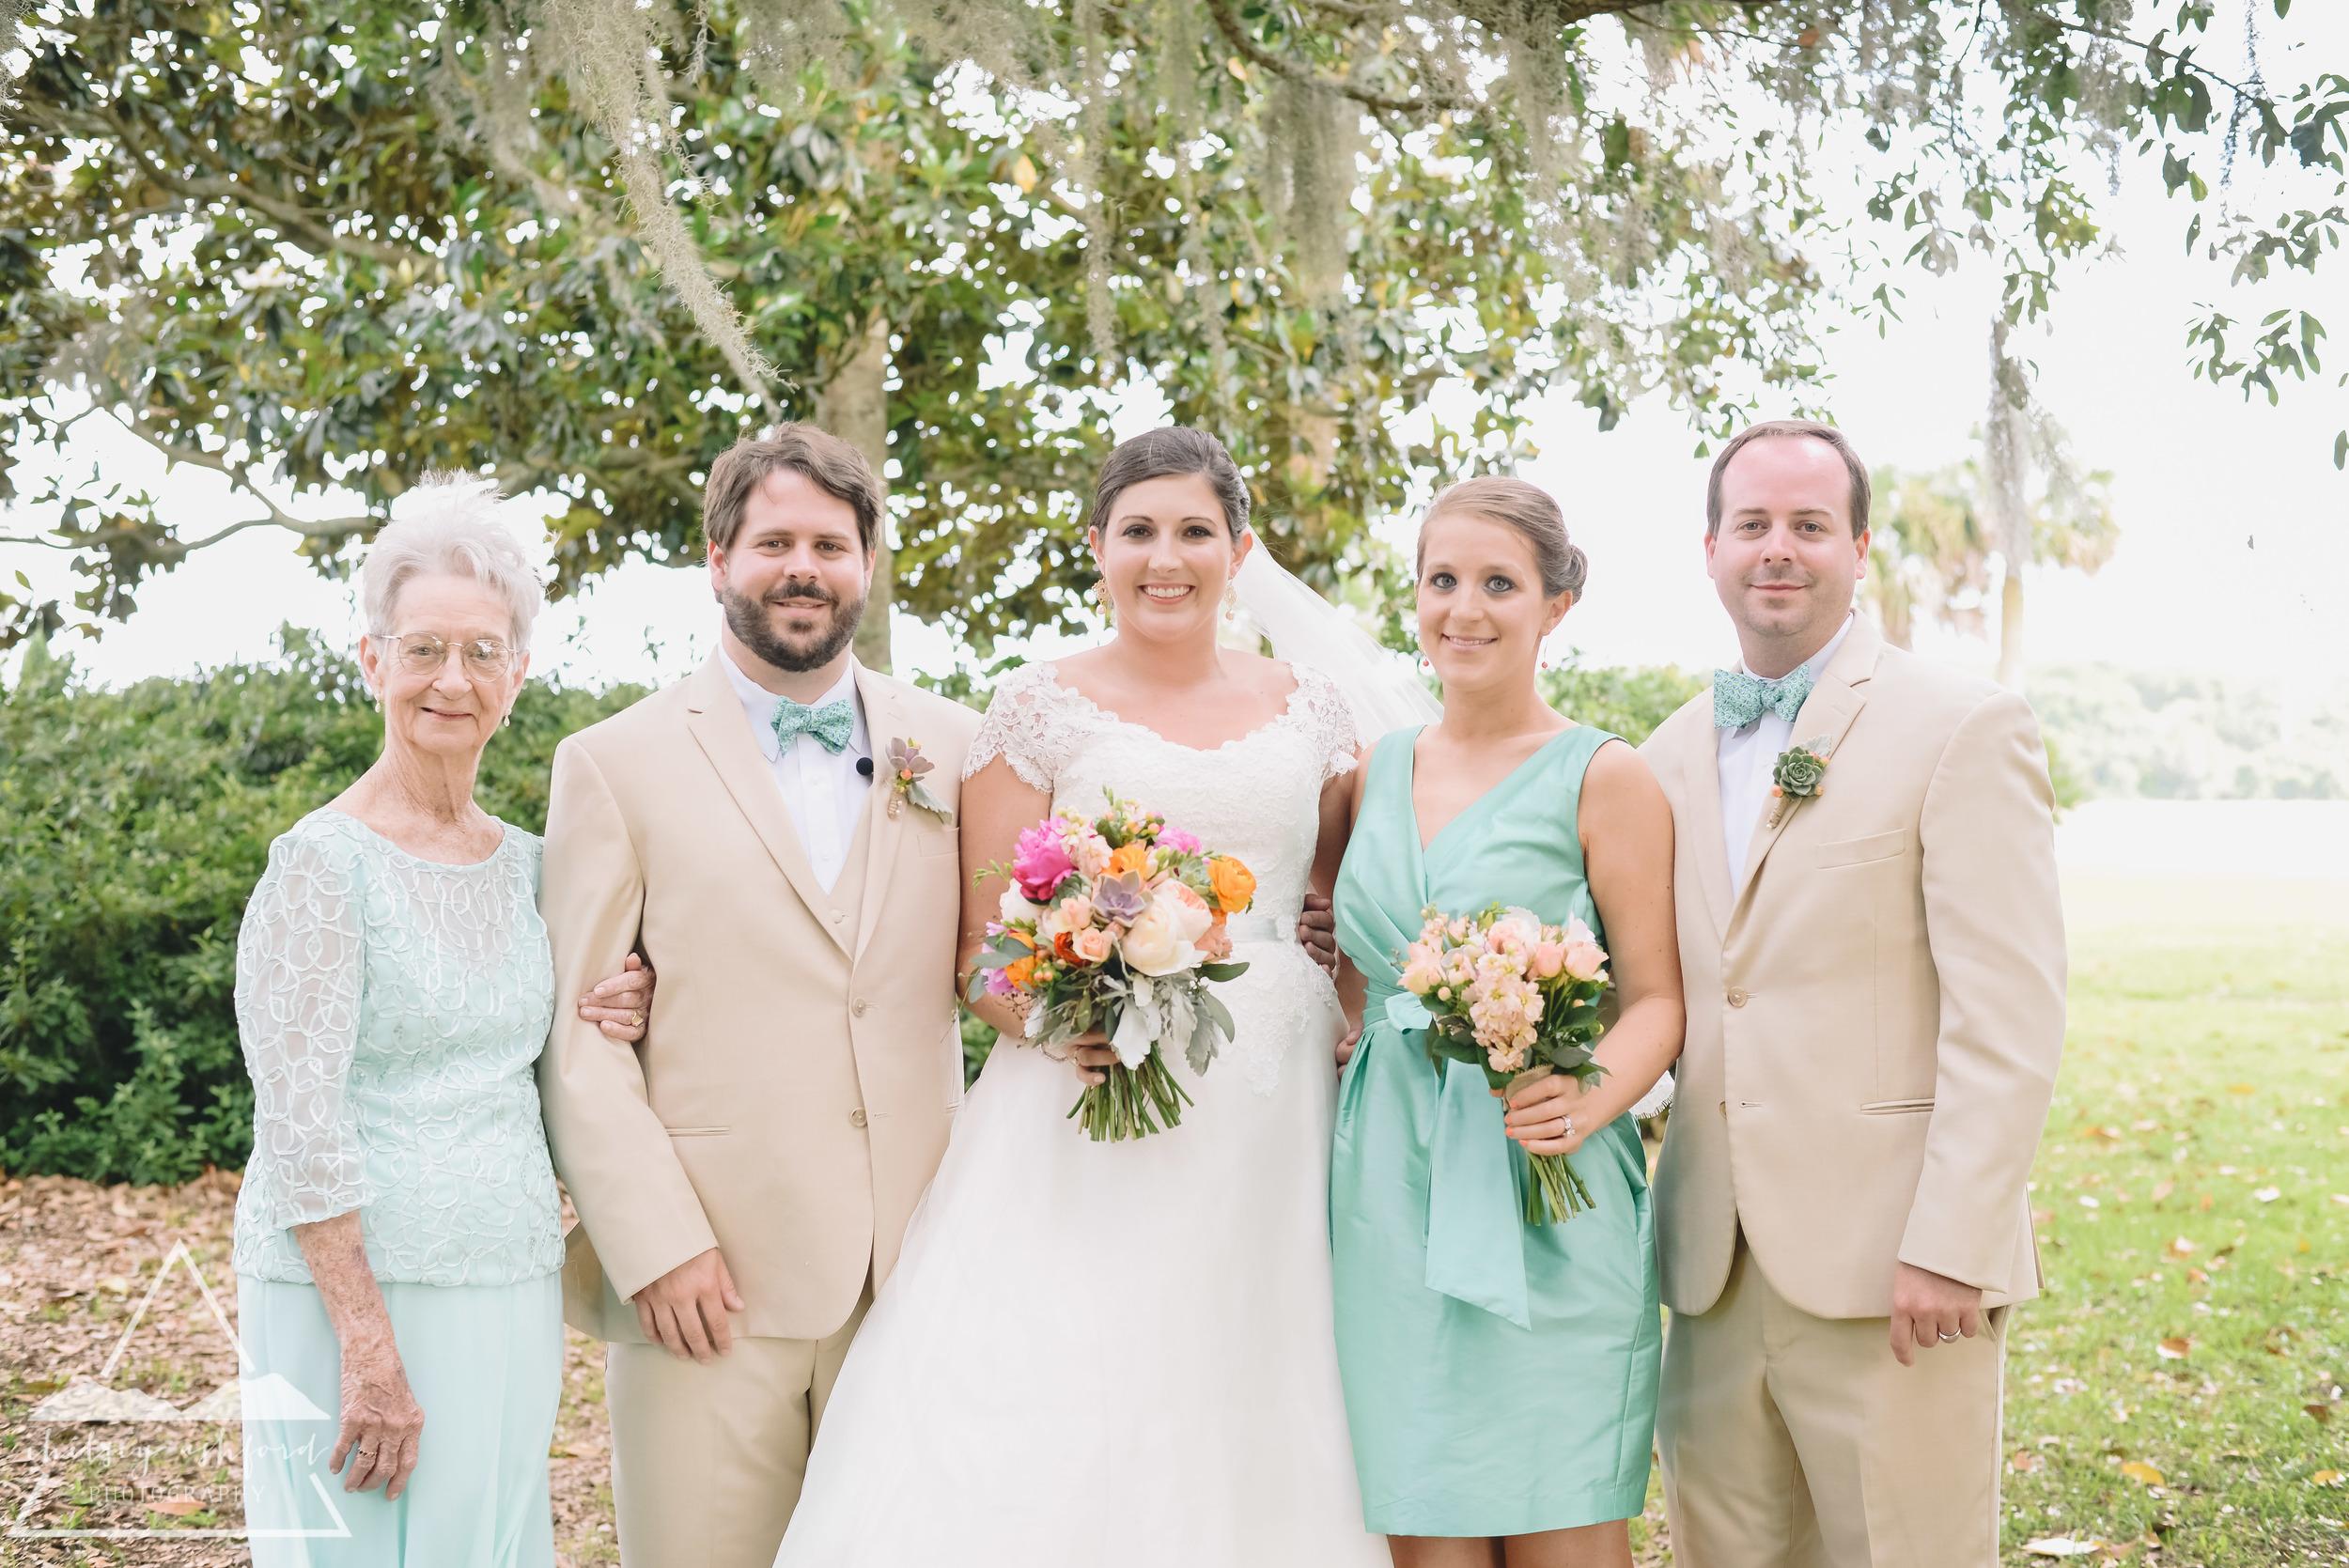 Clarkson_wedding_web-77.jpg